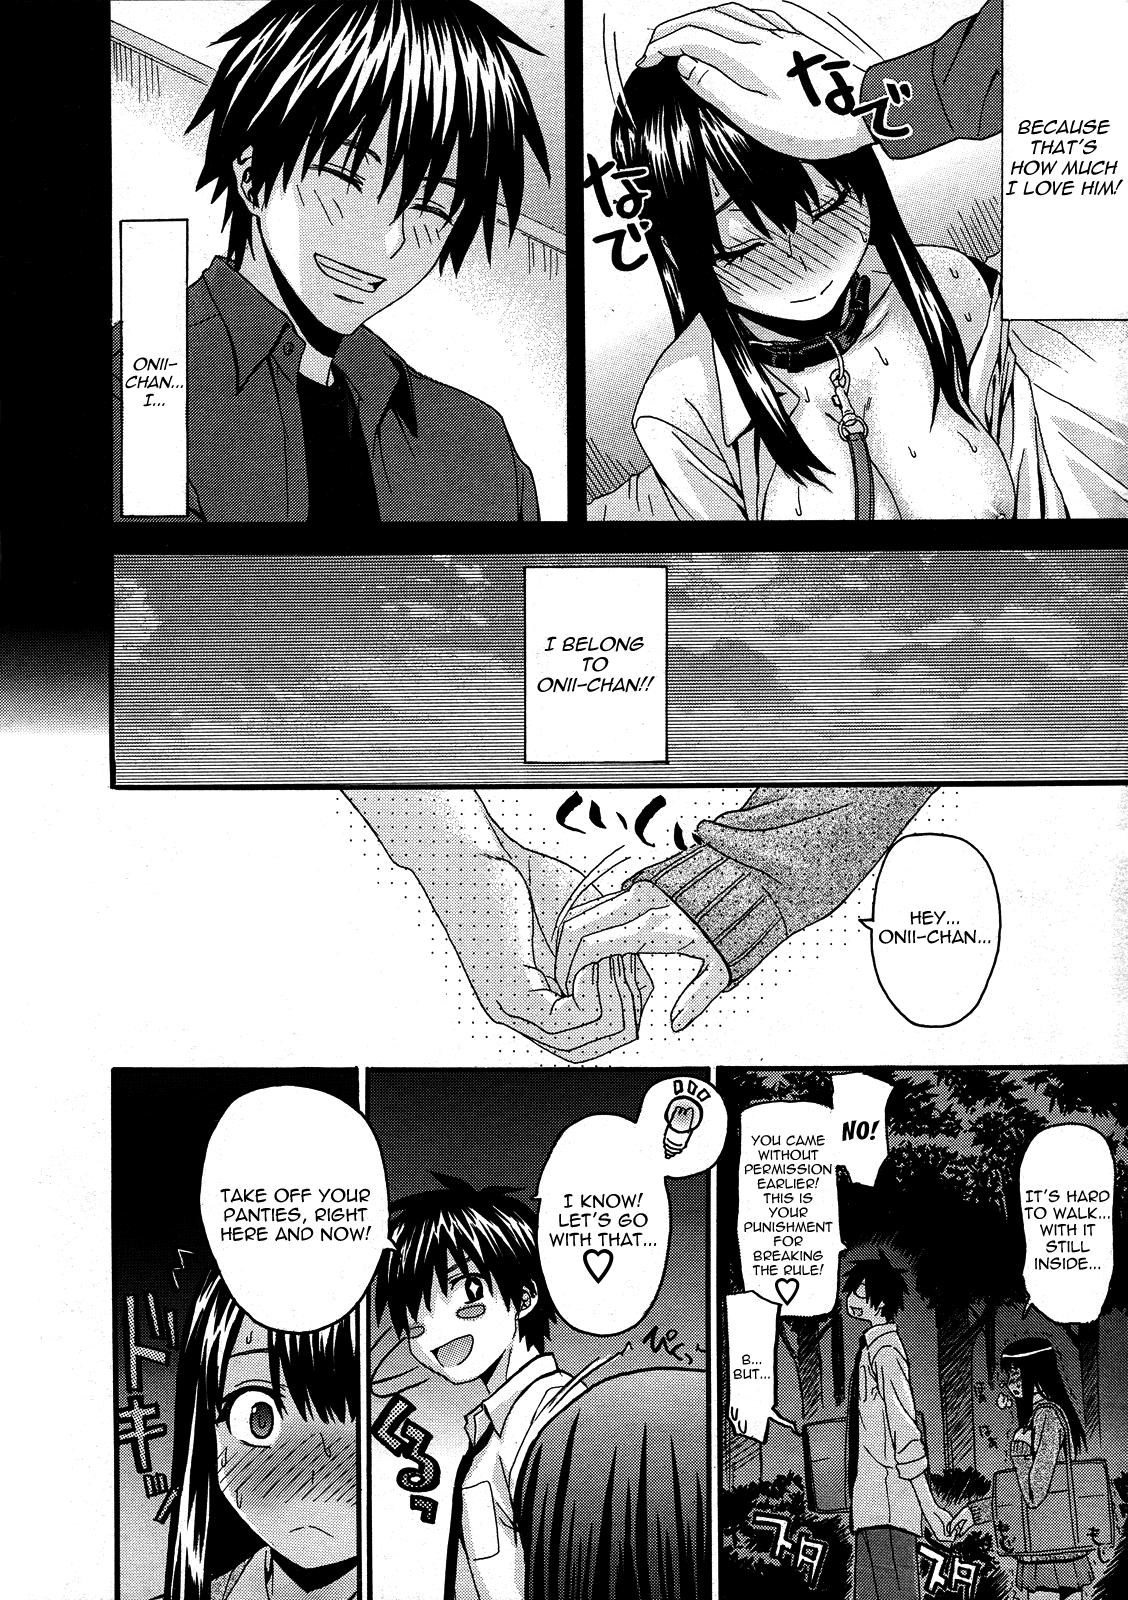 [Saegusa Kohaku] Onii-chan to Watashi | Onii-chan & I (COMIC Megastore 2011-12) [ENG] [Yoroshii] 7